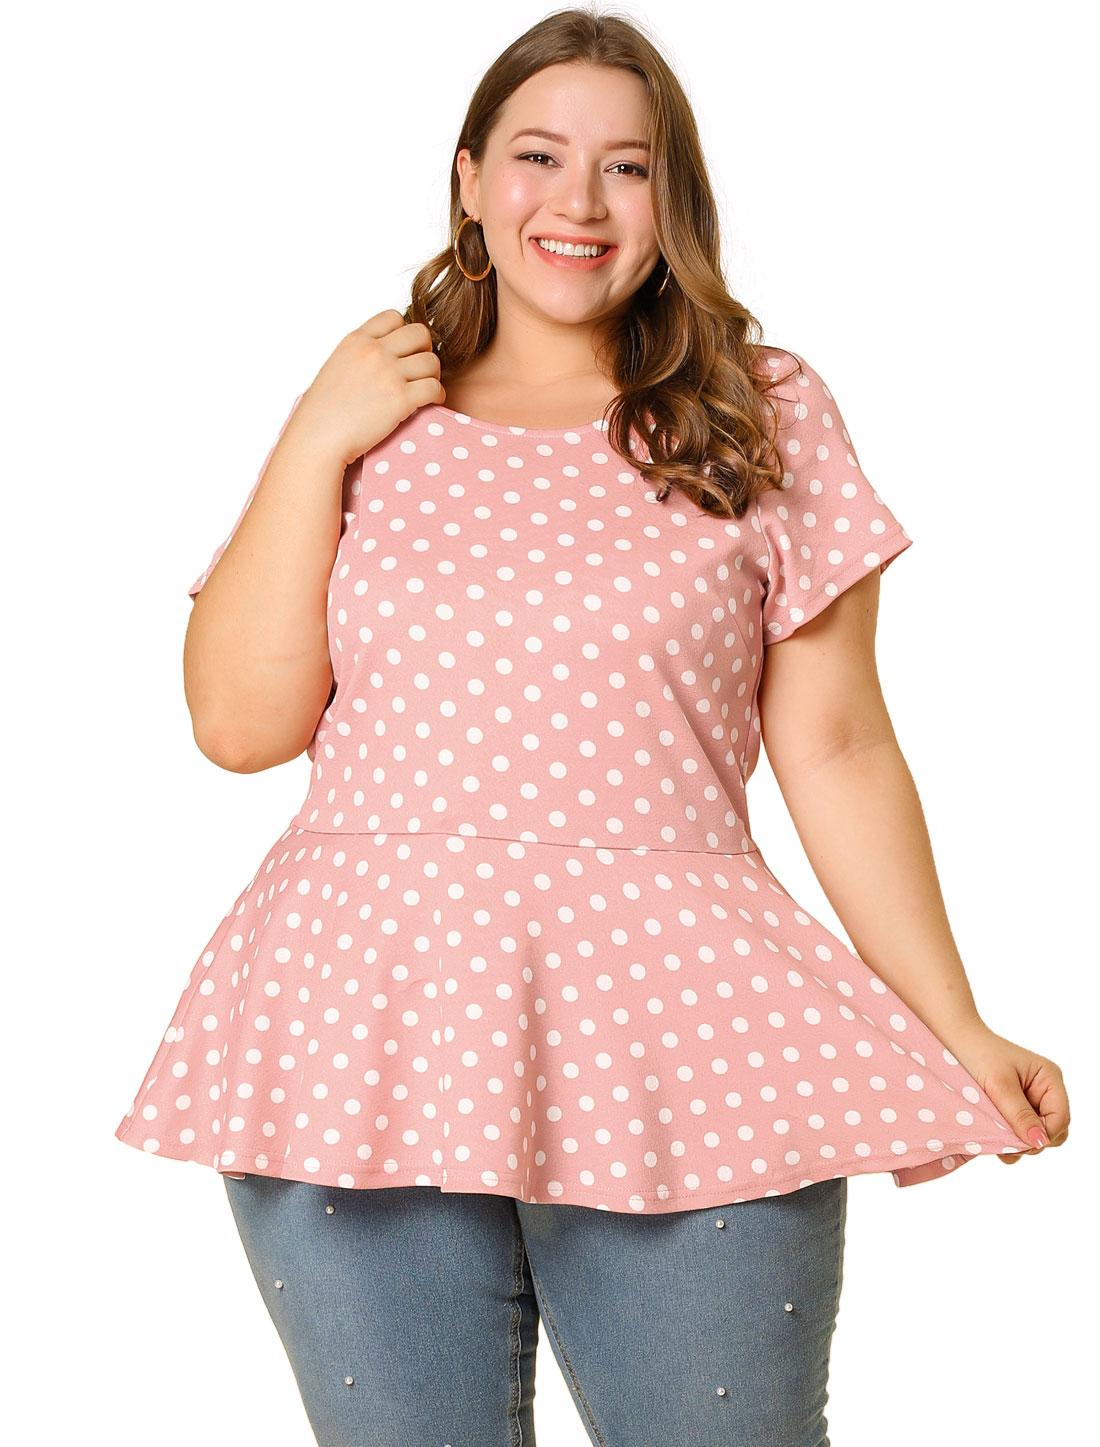 Women Plus Size Short Sleeves Polka Dots Peplum Top Pink 1X